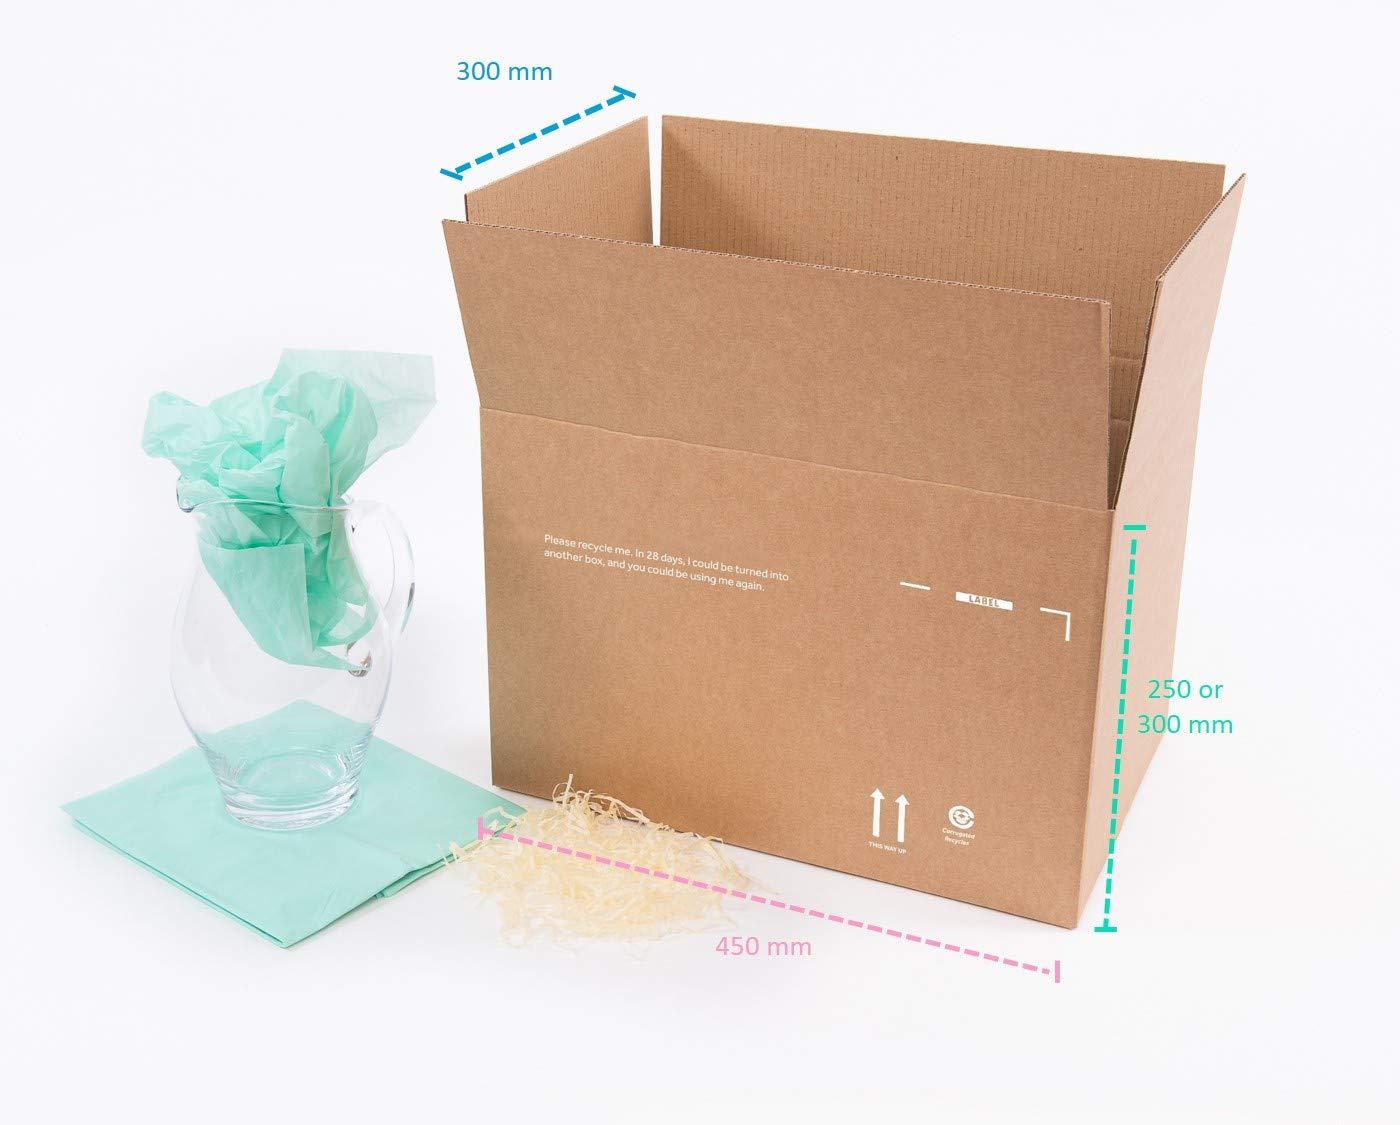 Medium Cardboard Box - Strong, Variable Height (pack of 20) Smurfit Kappa PSM2B